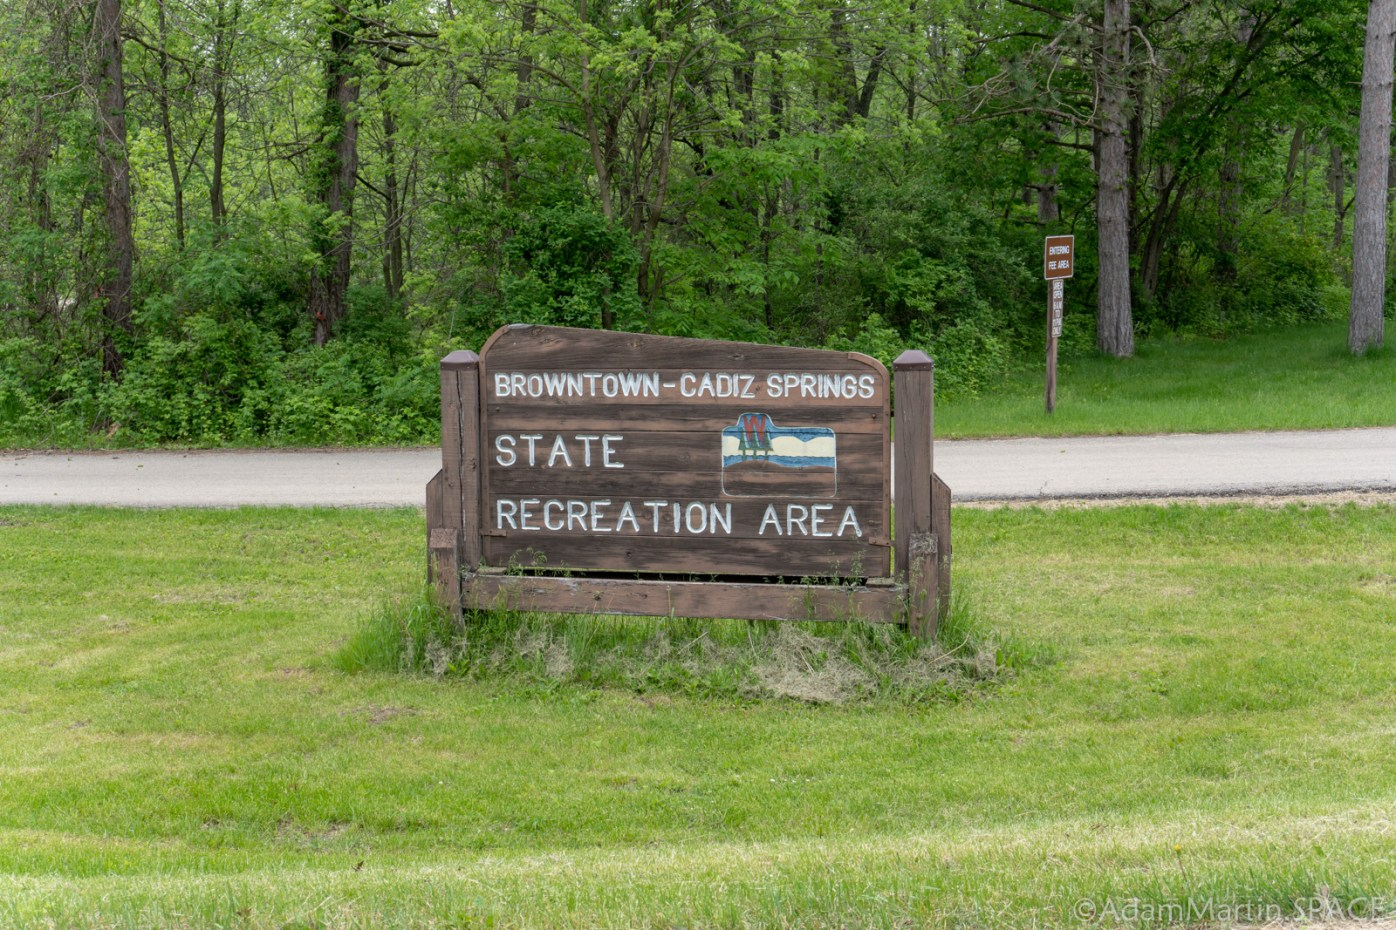 Cadiz Springs State Recreation Area - Entrance Sign